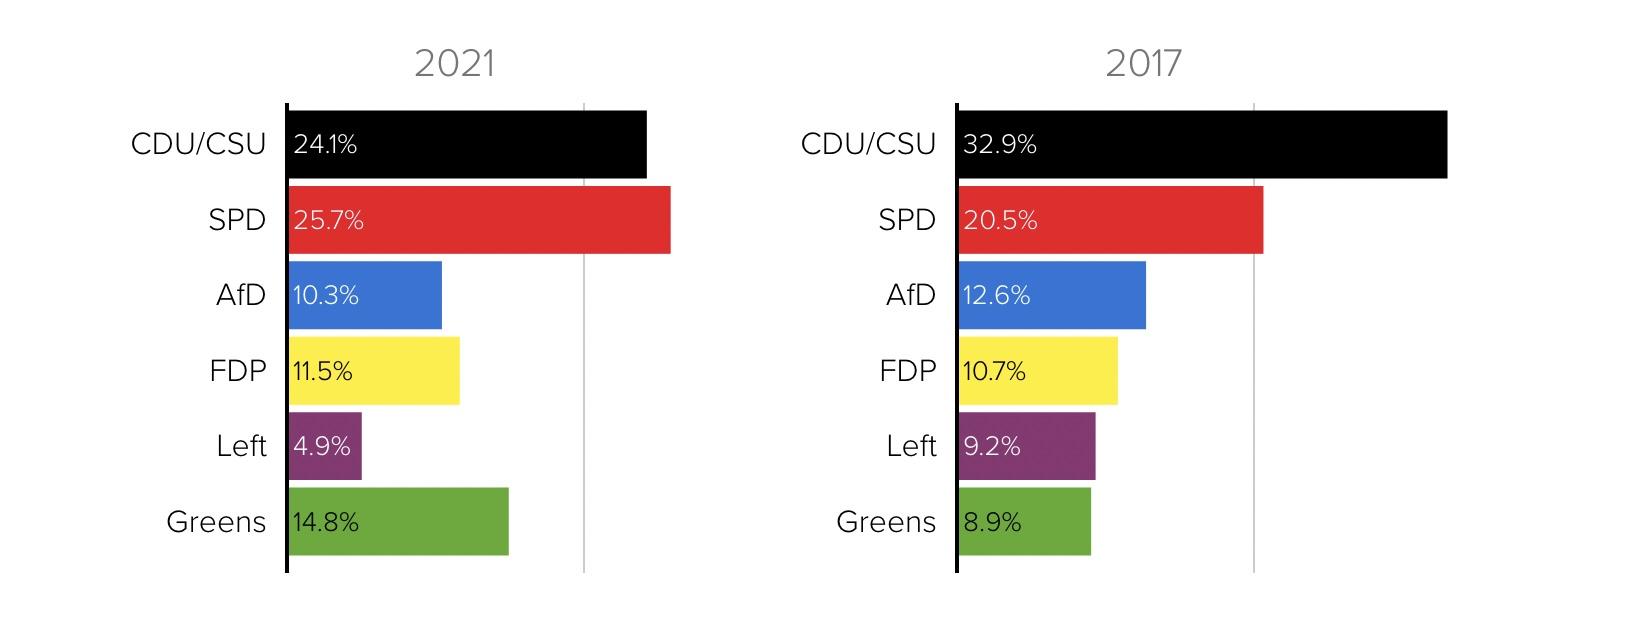 Social Democrats narrowly win German elections